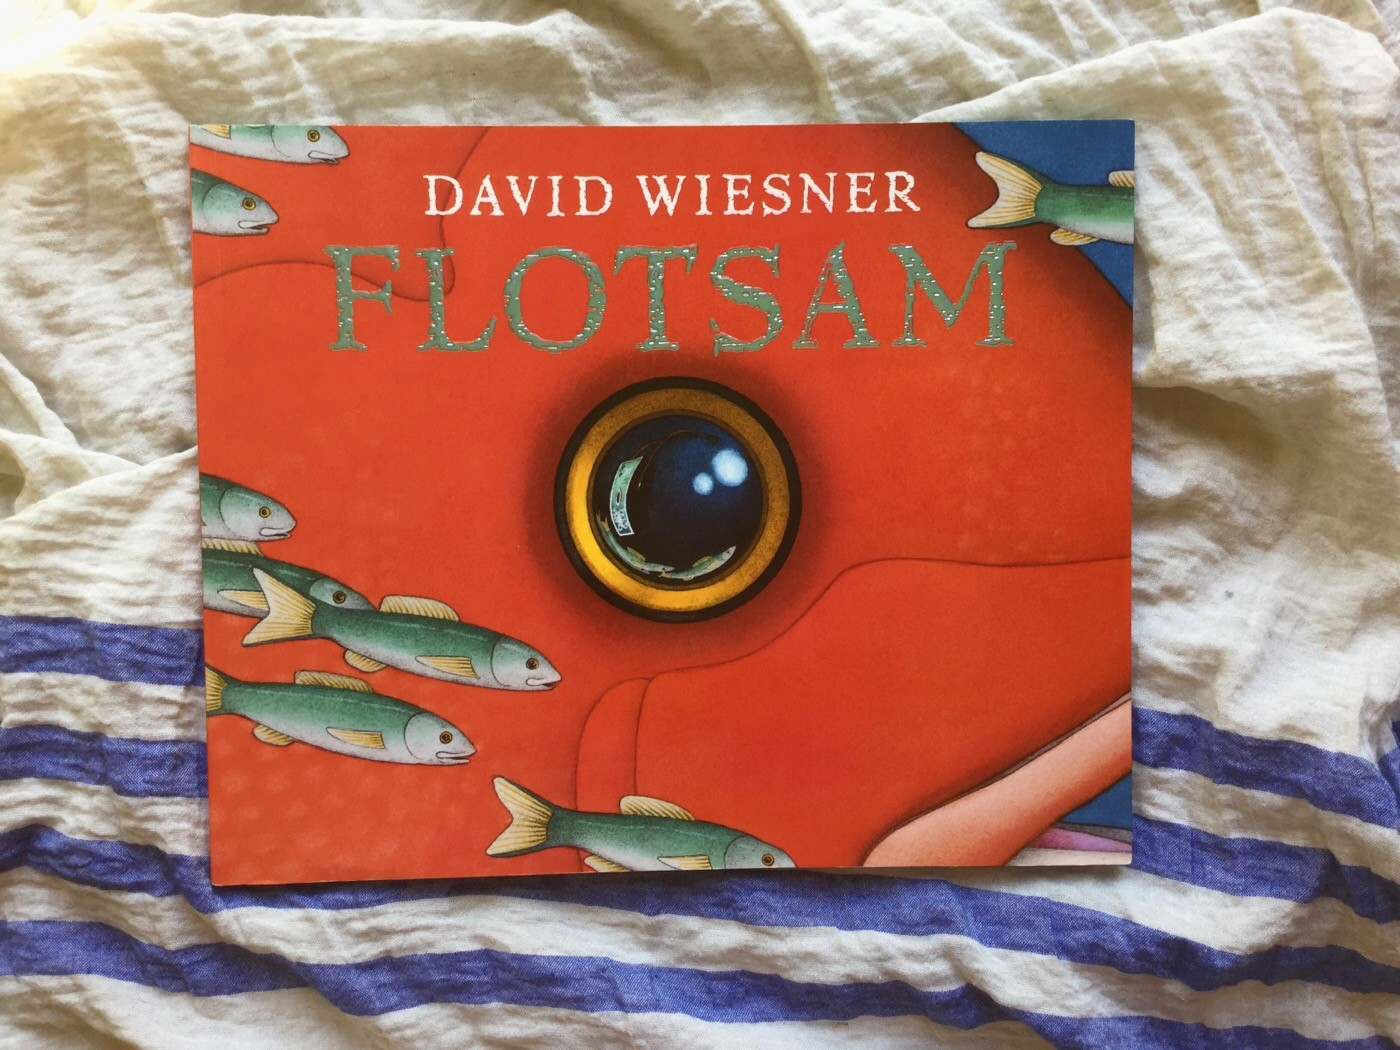 Flotsam-david-wiesner-galline-volanti